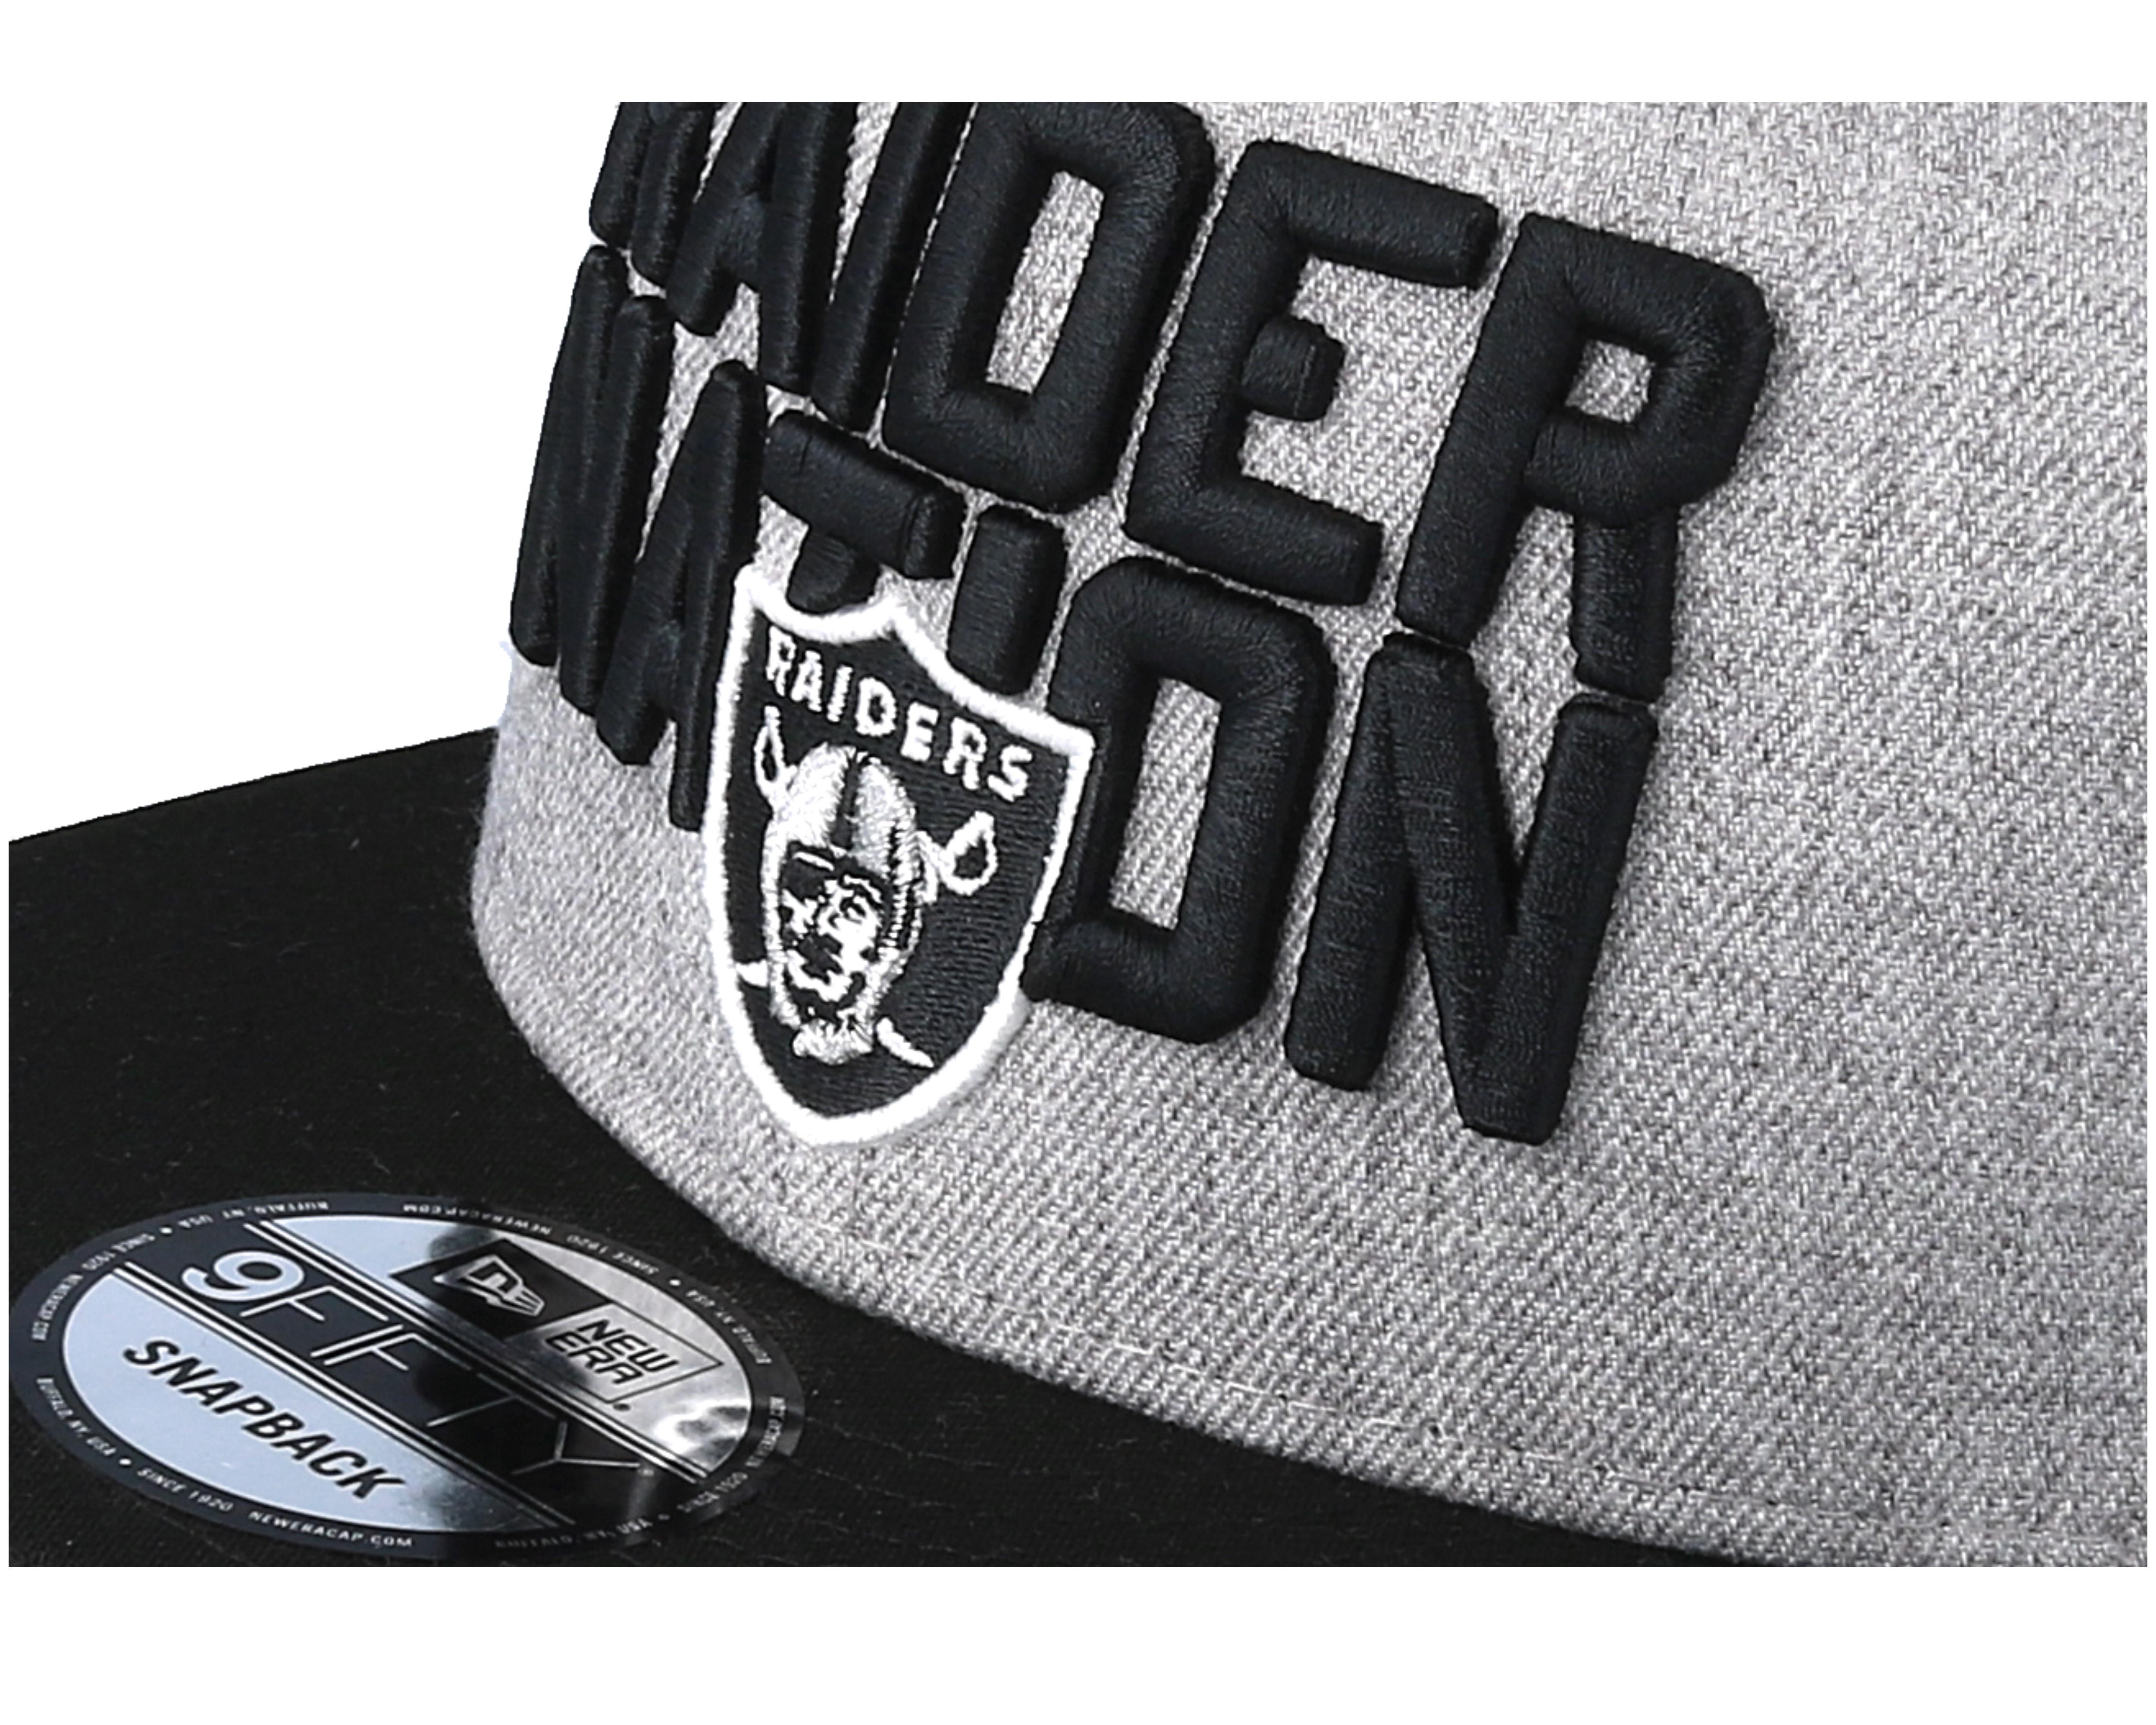 new styles 6f7d9 26482 Oakland Raiders 2018 NFL Draft On-Stage Grey Black Snapback - New ...